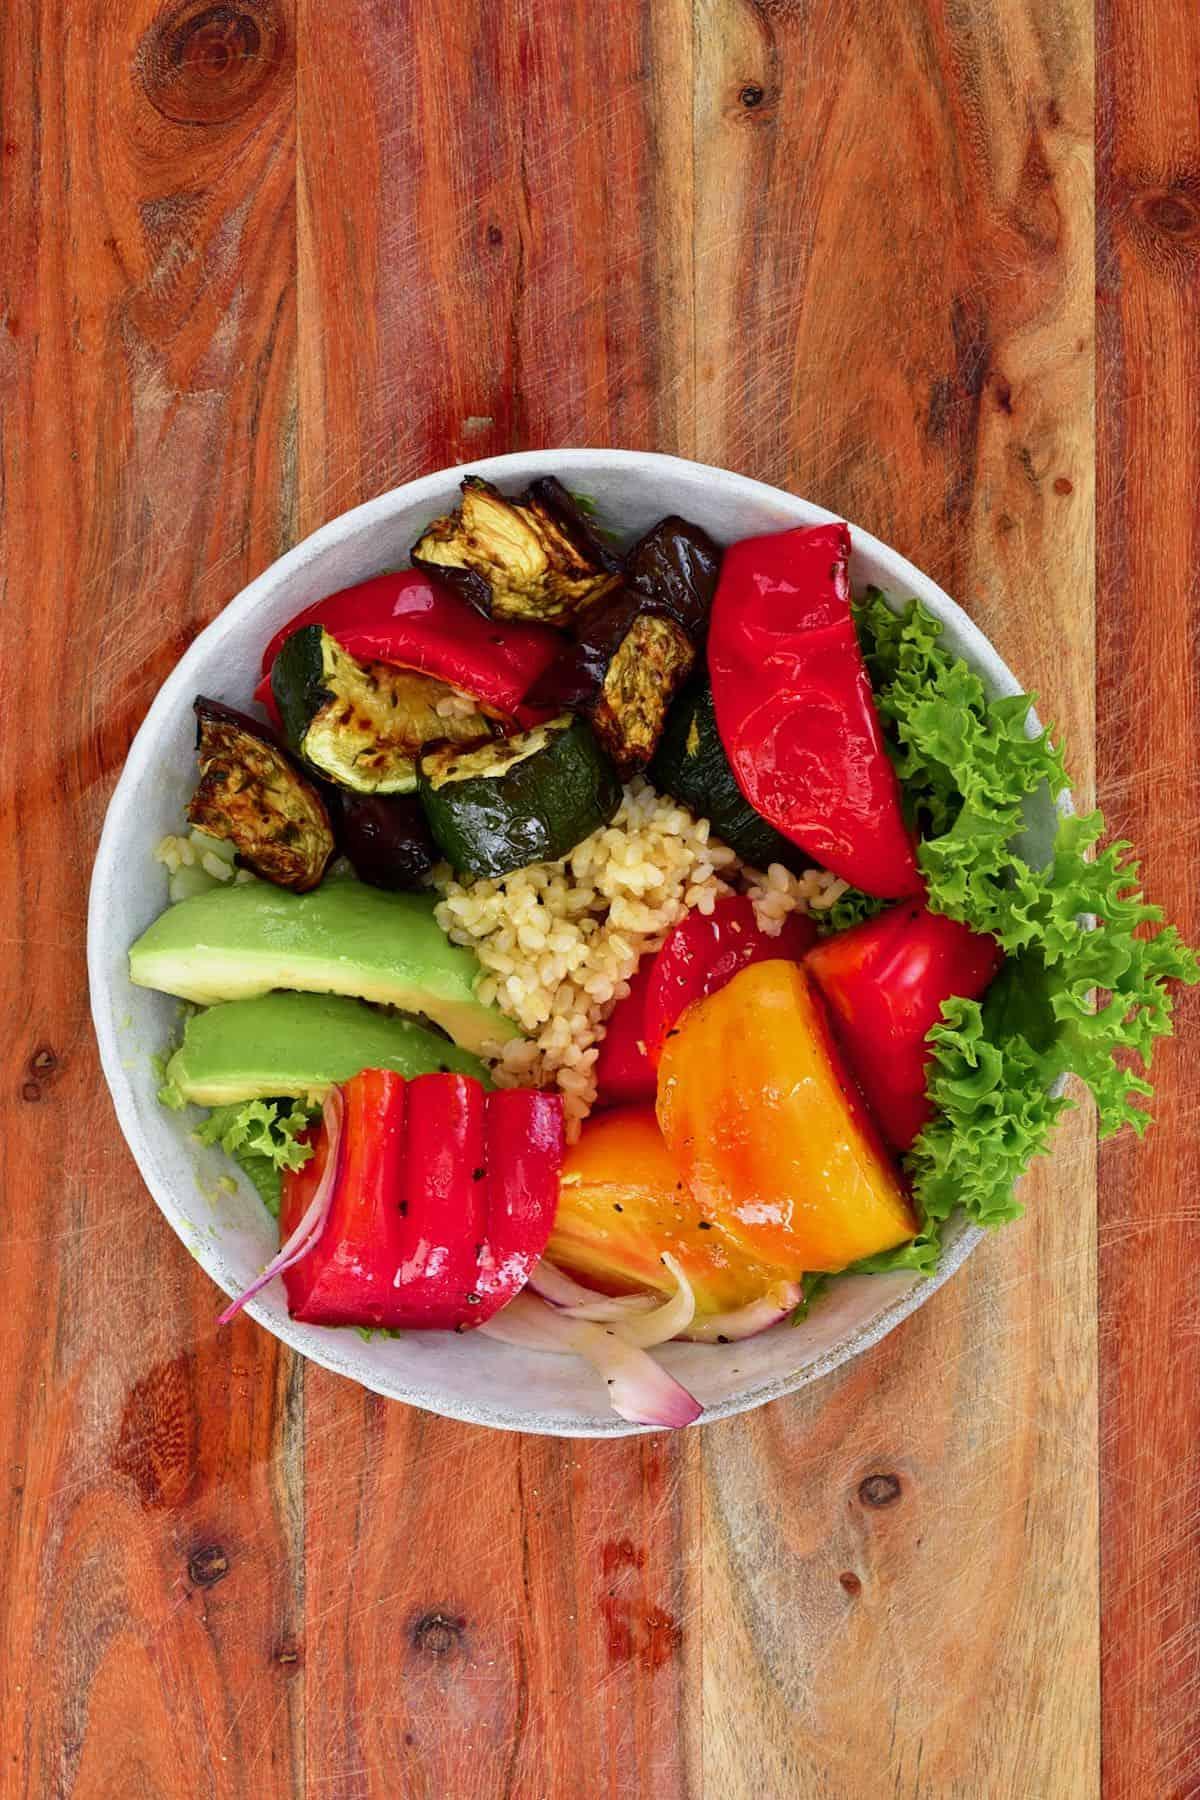 A bowl of roasted veggie salad